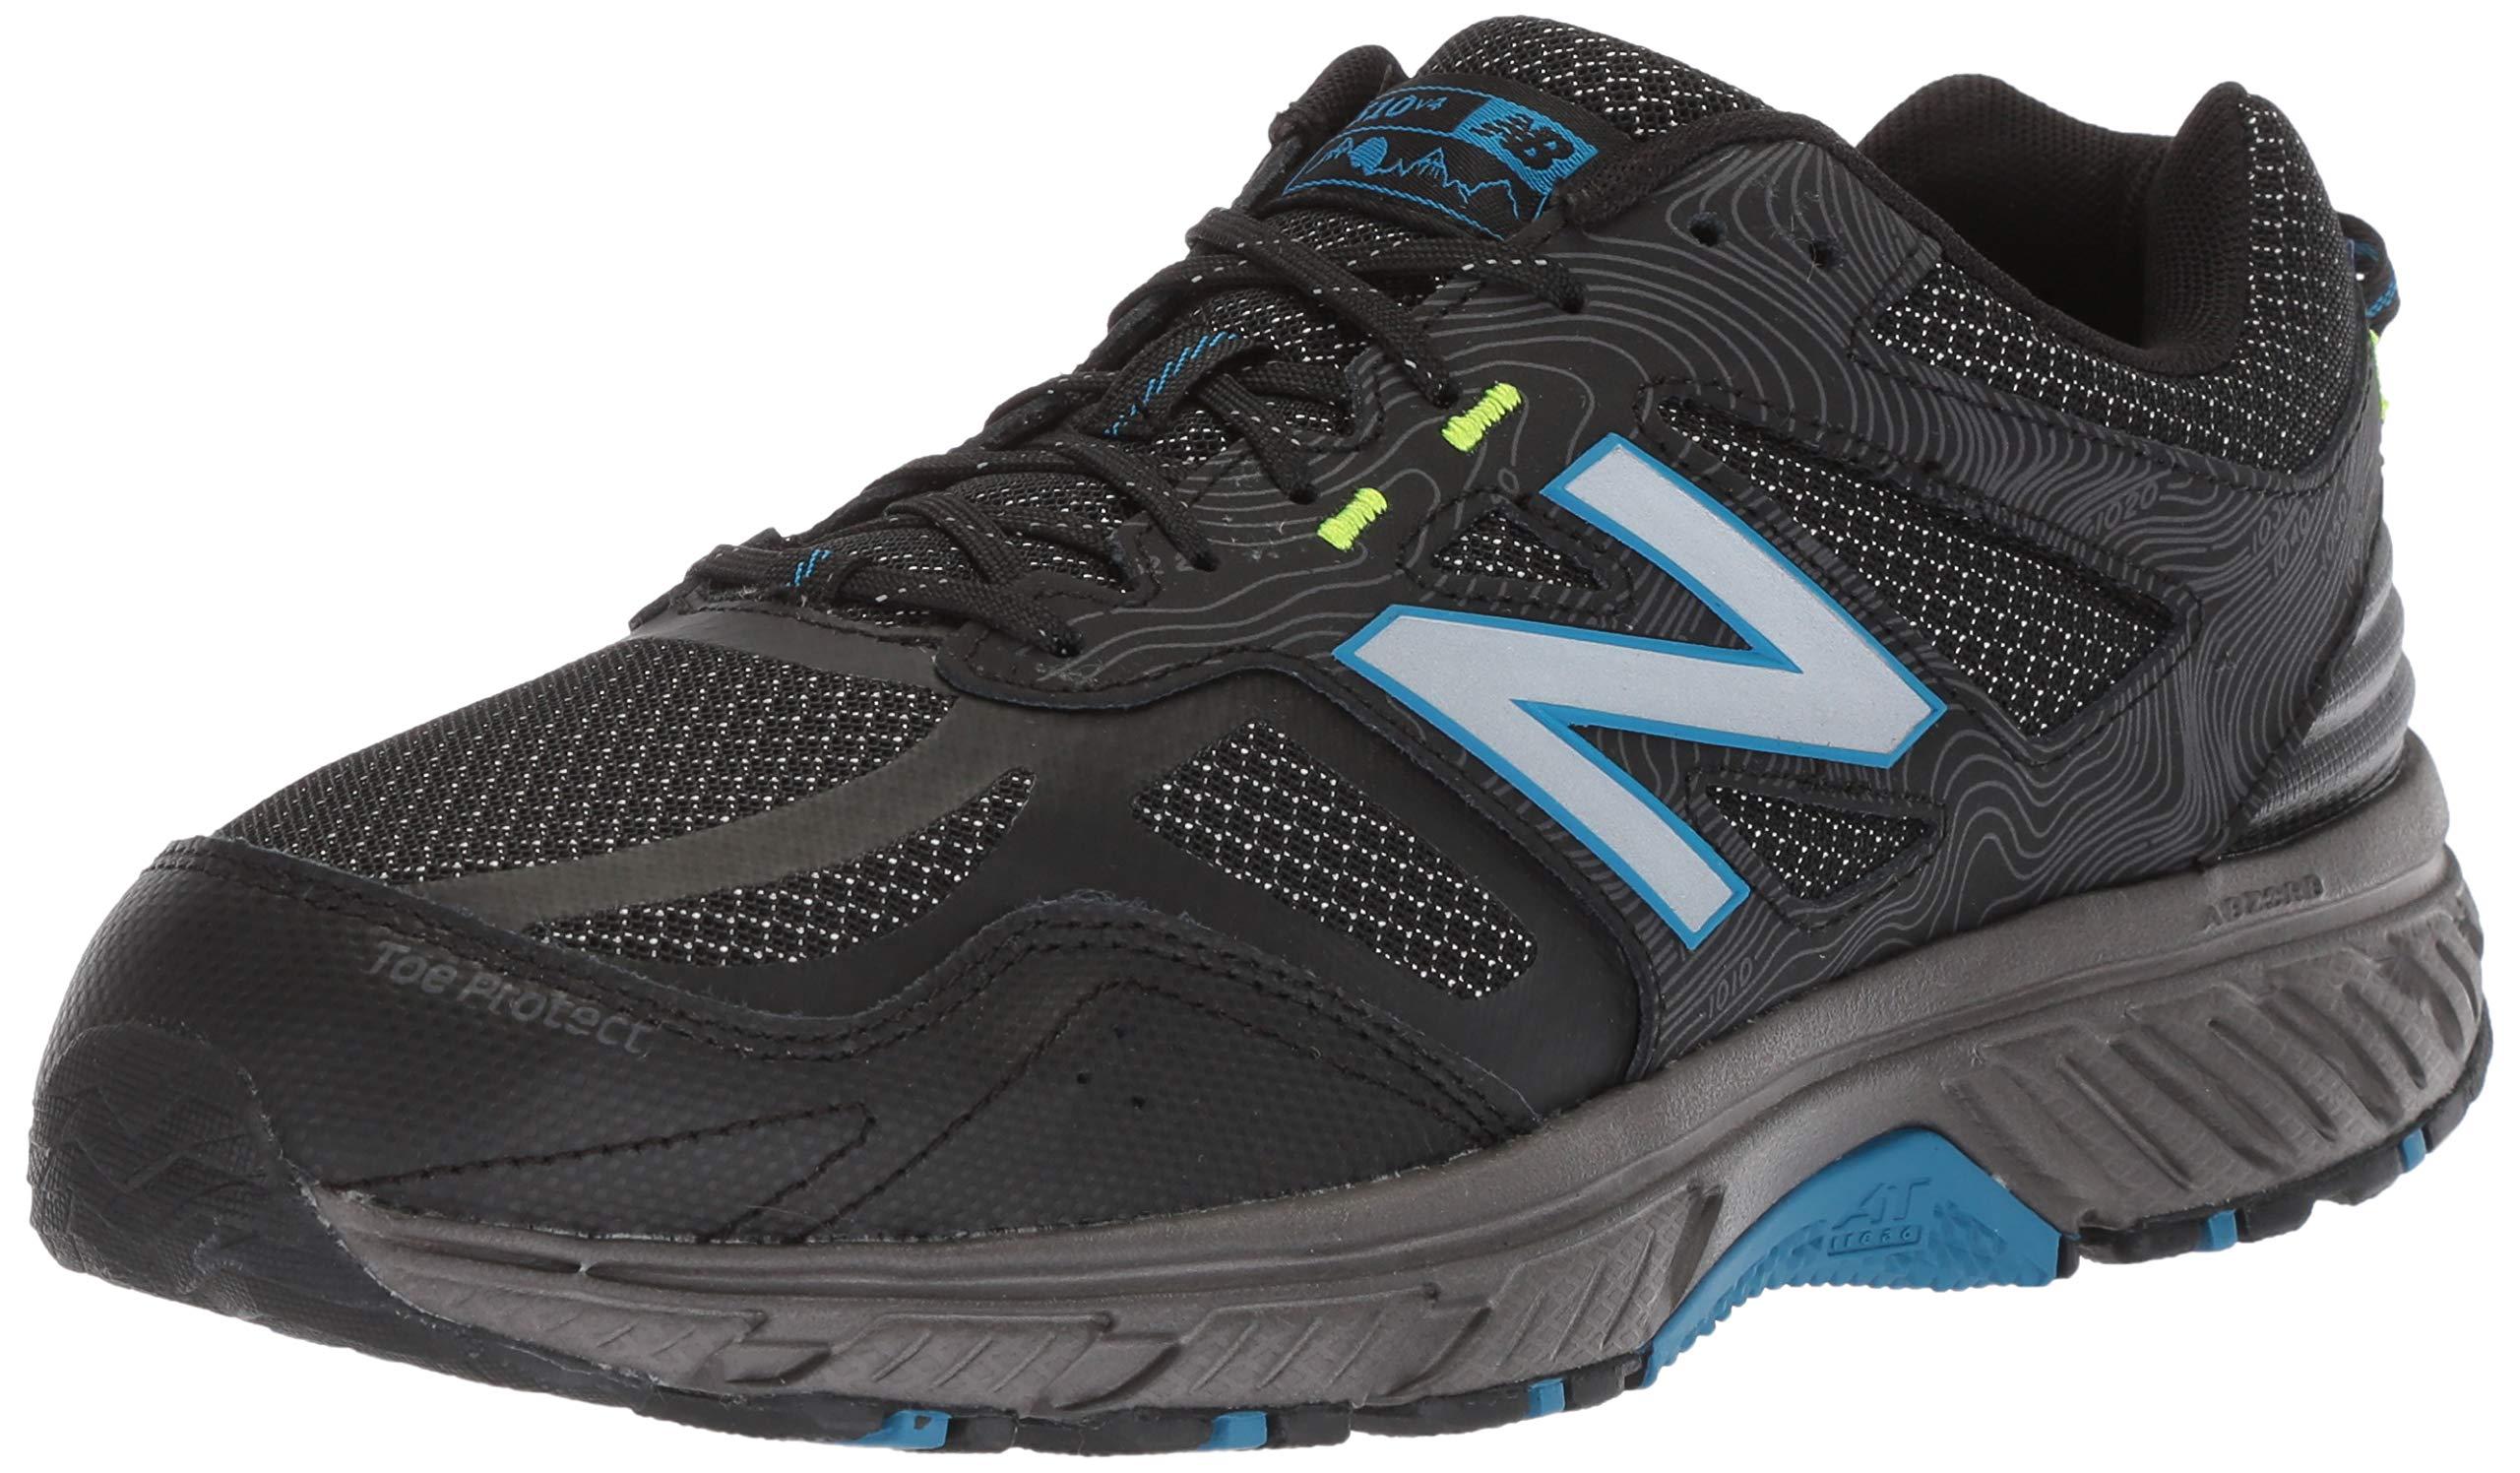 New Balance Men's 510v4 Cushioning Trail Running Shoe, Magnet/Black/Reflective, 7.5 D US by New Balance (Image #1)